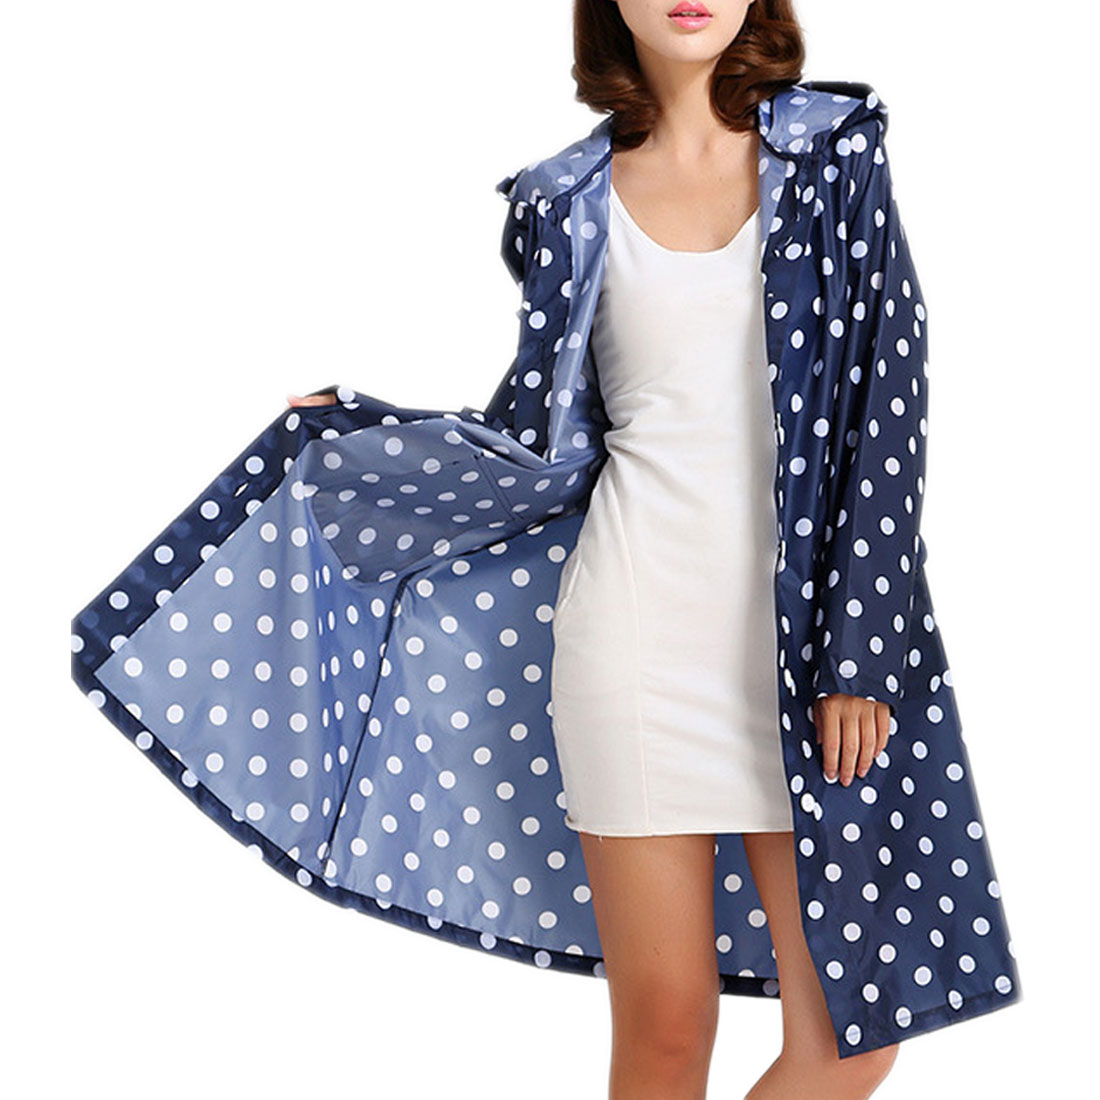 Women Poncho Long Rainwear Raincoat Jacket Waterproof Cloth Rain Coat Girl Lady Hooded Raincoat Outdoor Travel in Raincoats from Home Garden